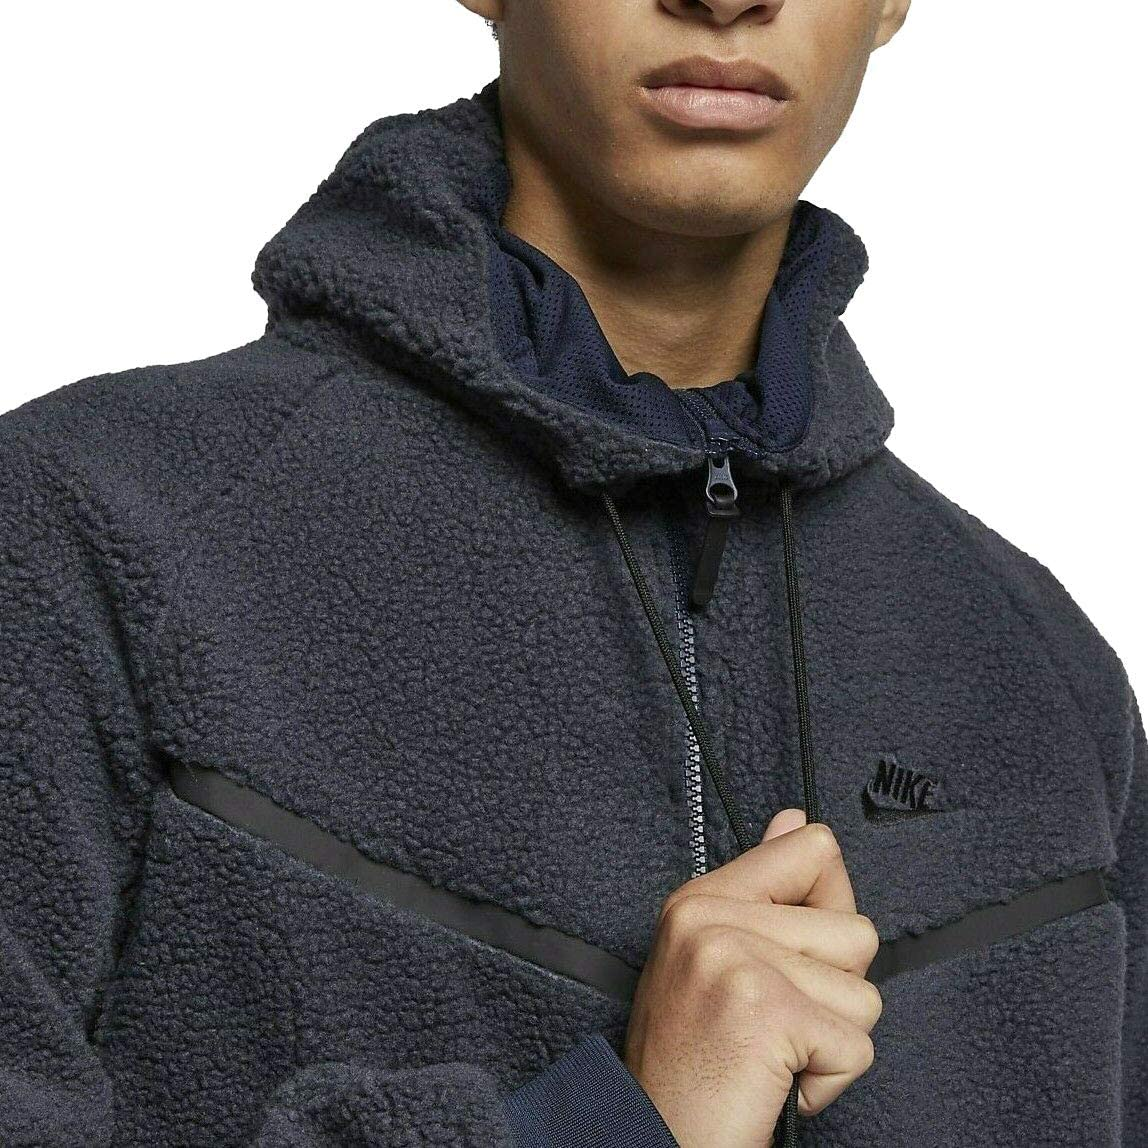 Falsificación arpón En respuesta a la  Amazon.com: Nike Men's Tech Icon Sherpa Fleece Windrunner Jacket Navy Black  Aq2767-451 (M): Clothing